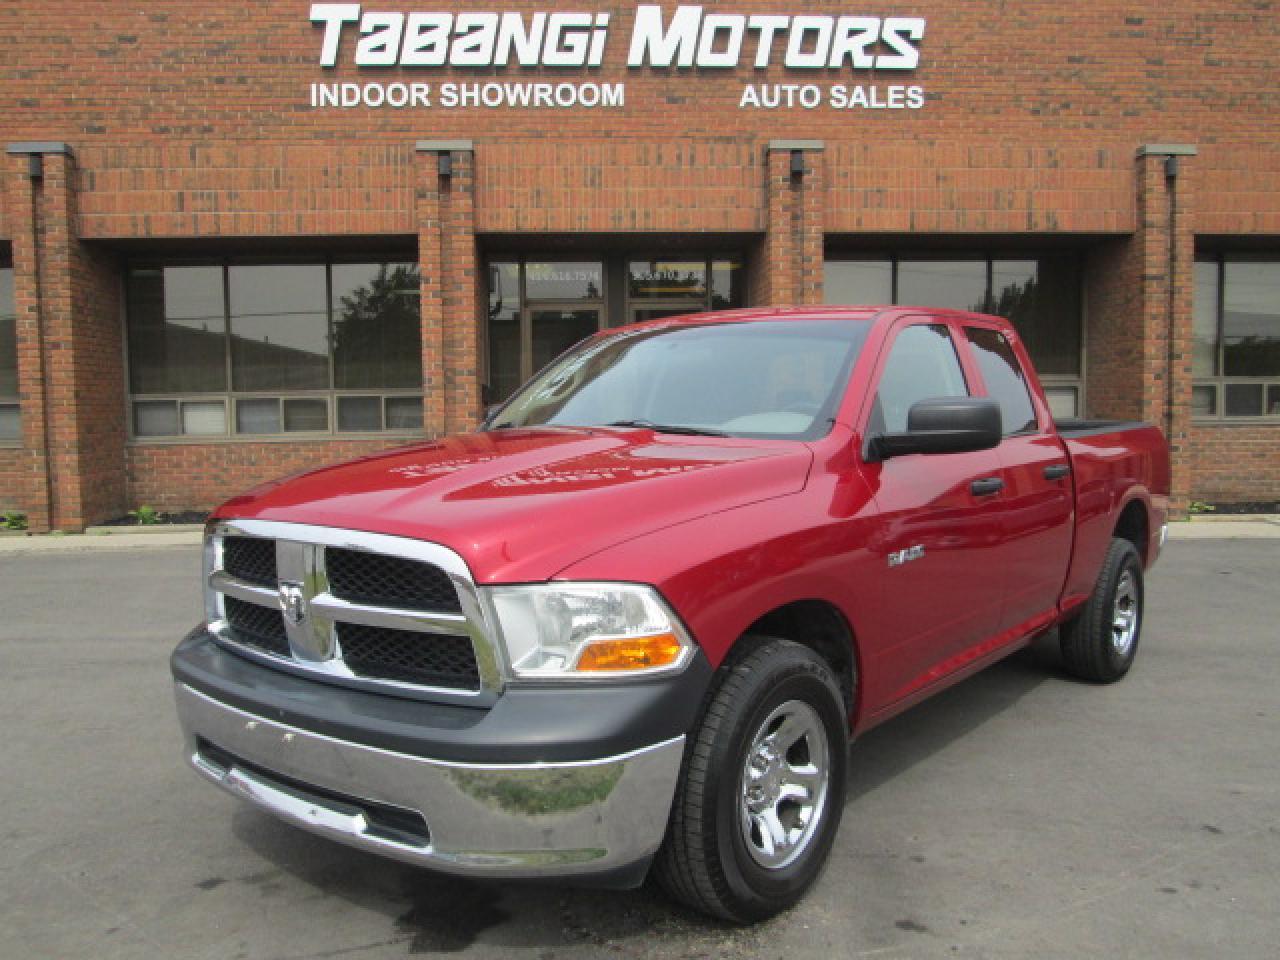 Photo of Red 2010 Dodge Ram 1500